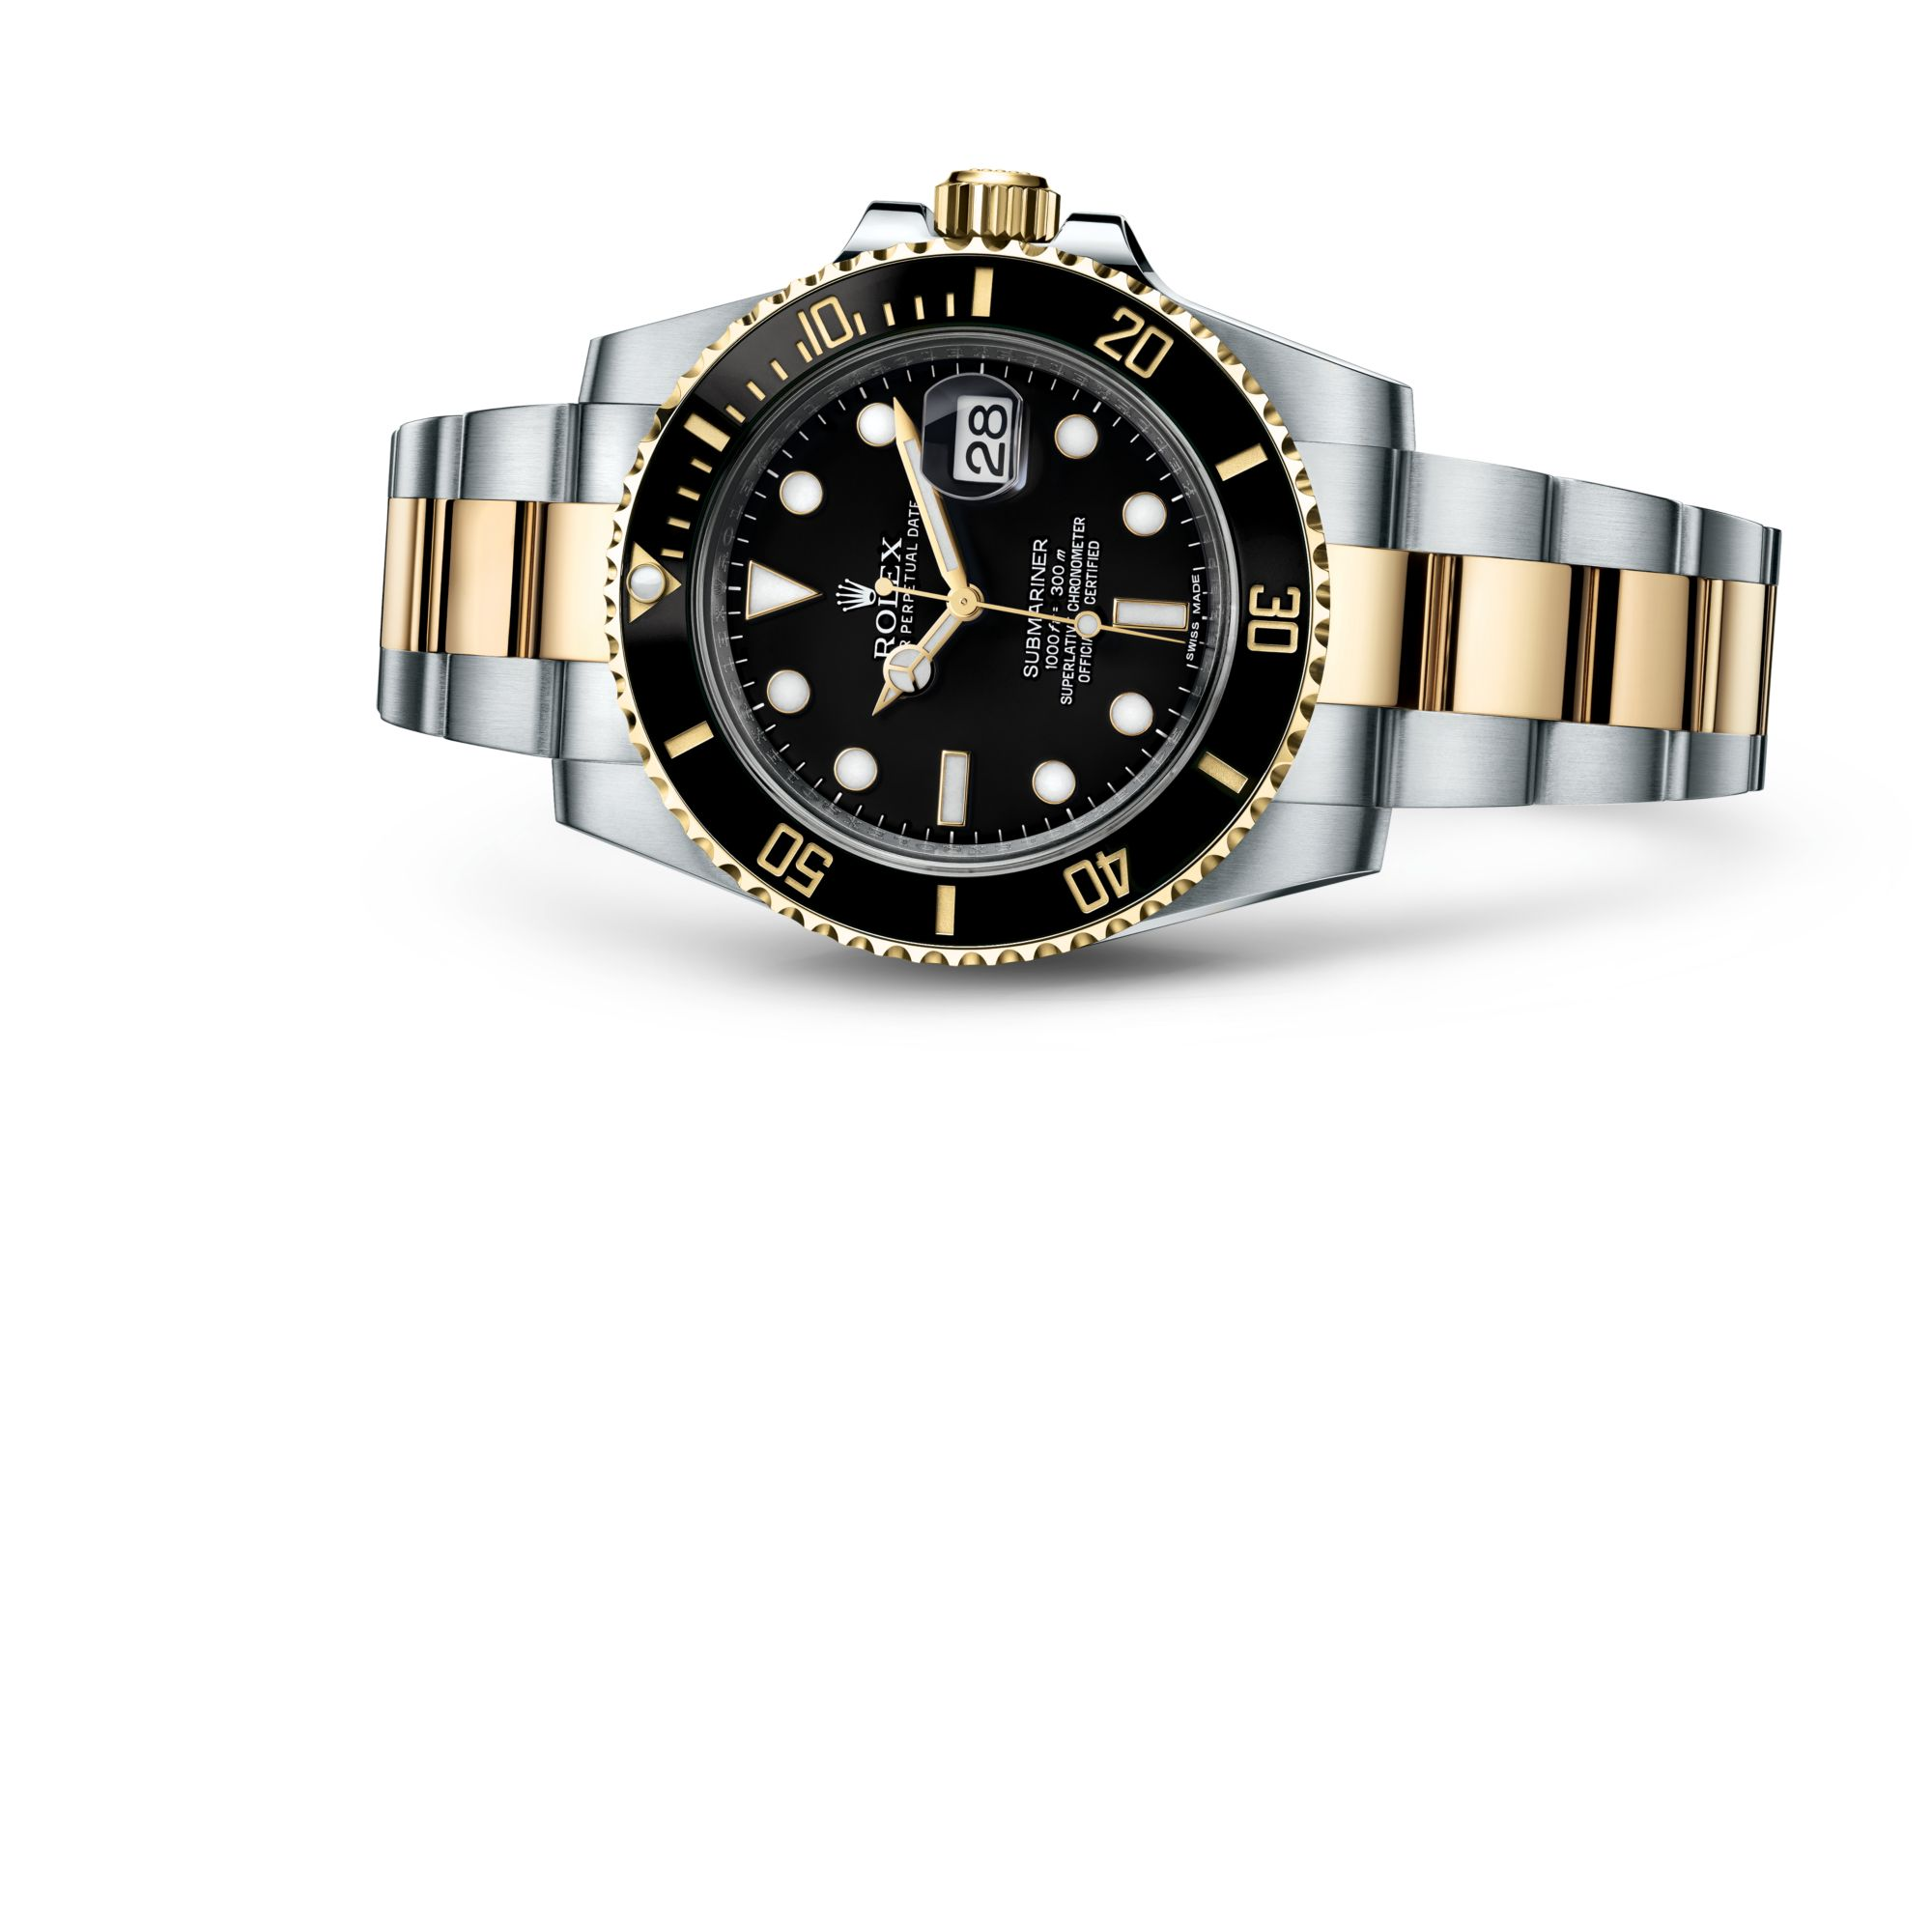 Rolex Submariner Date M116613LN-0001